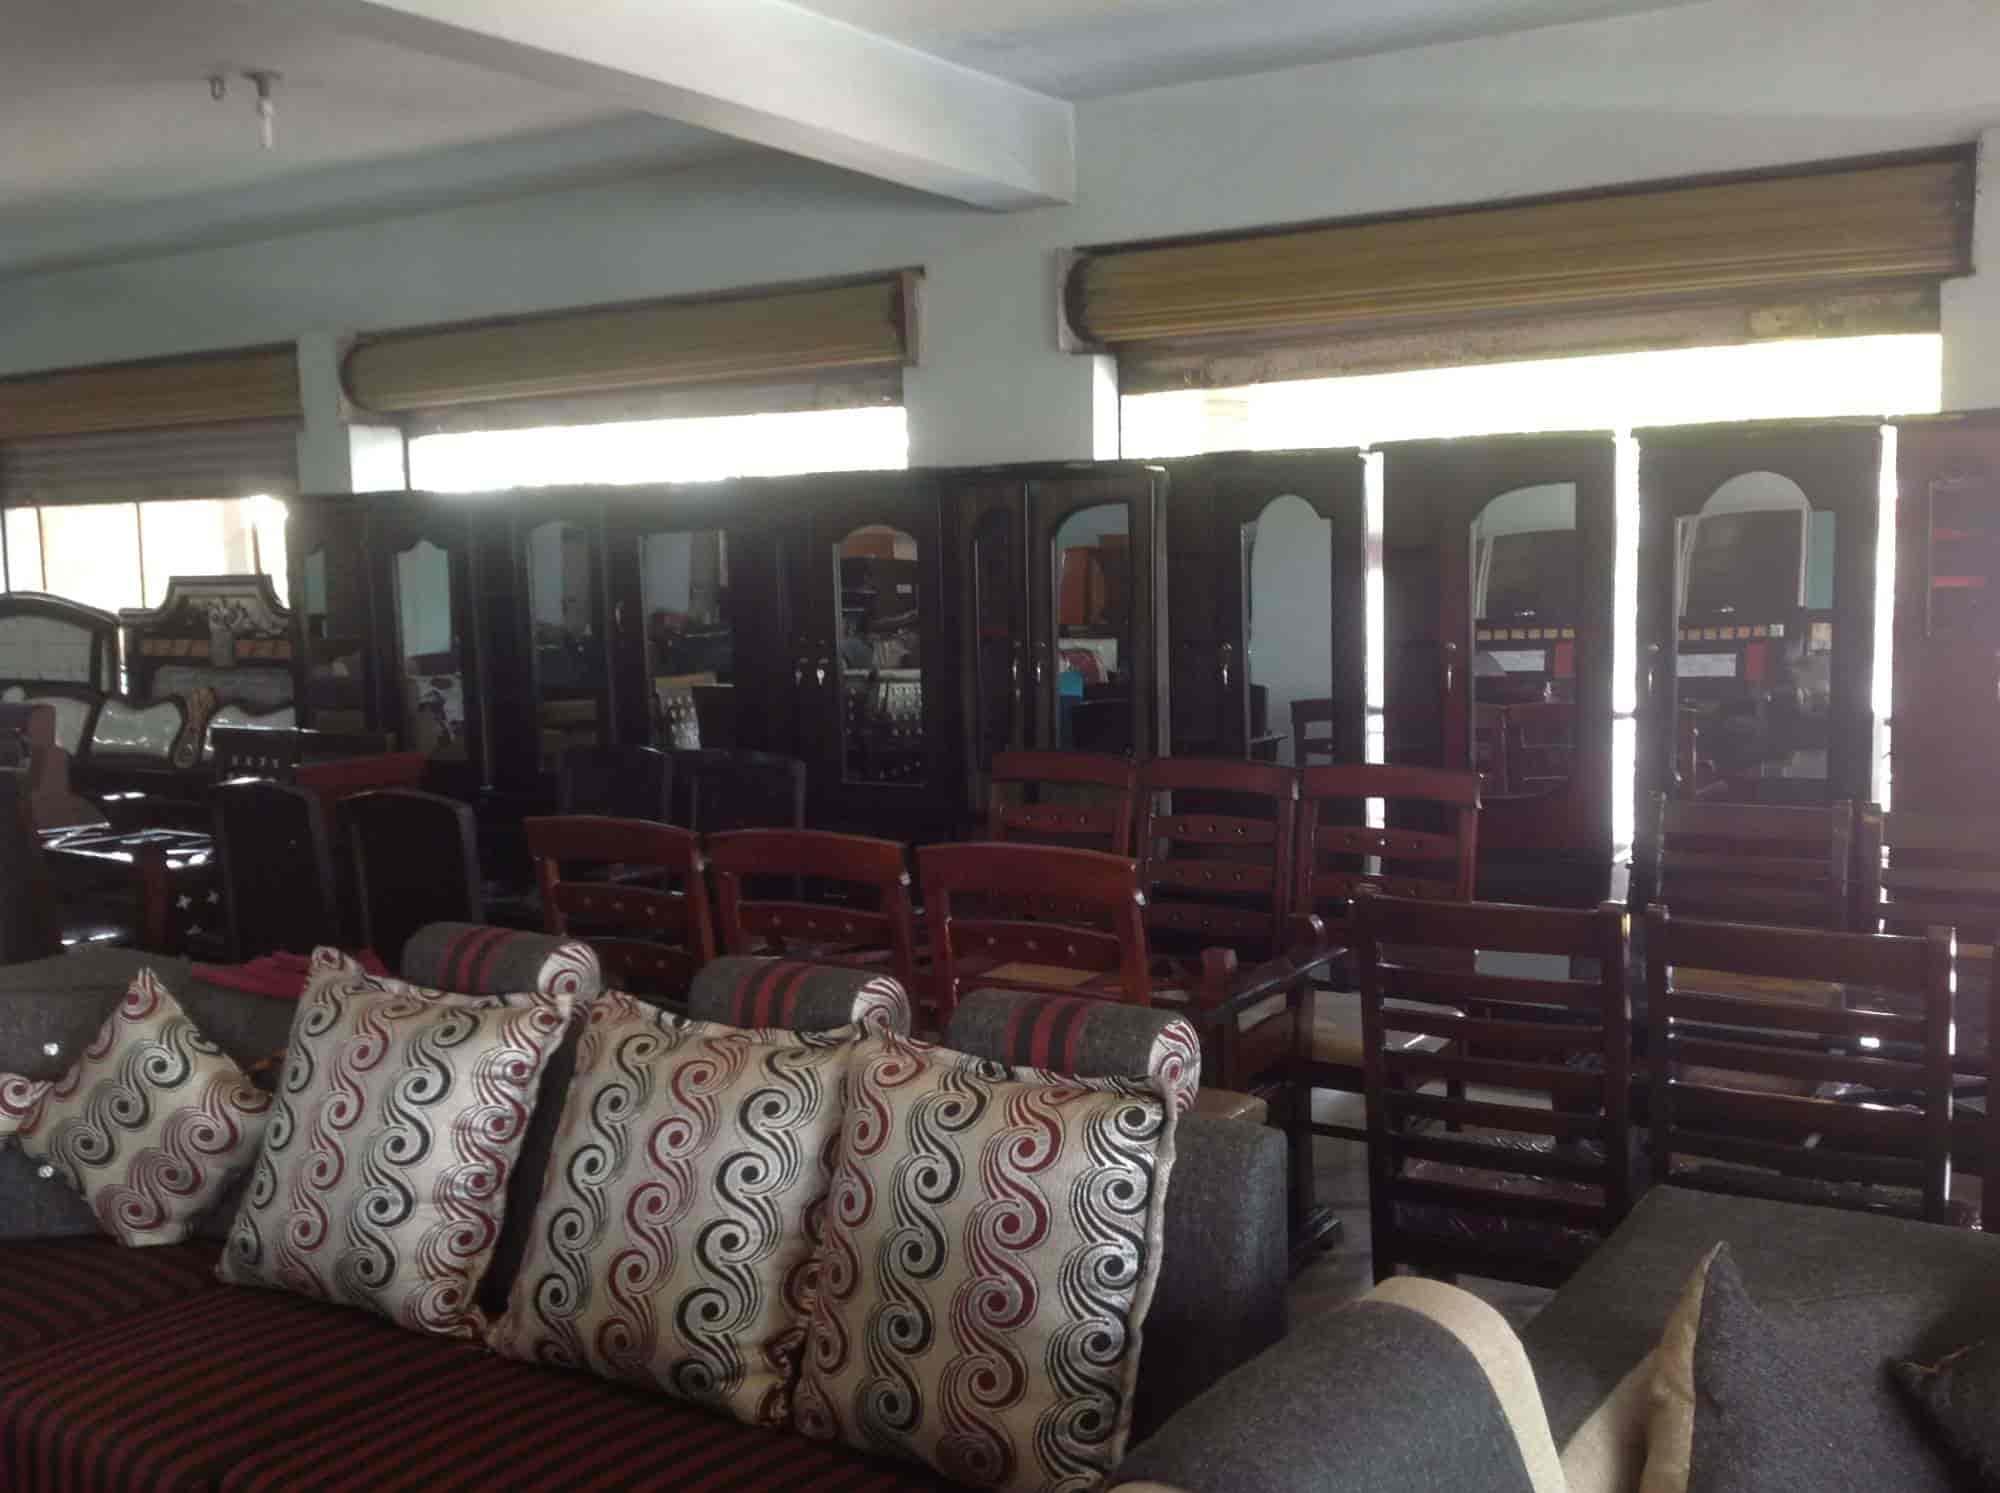 M S Furniture World, Ramachandra Puram   Carpenters In Hyderabad   Justdial